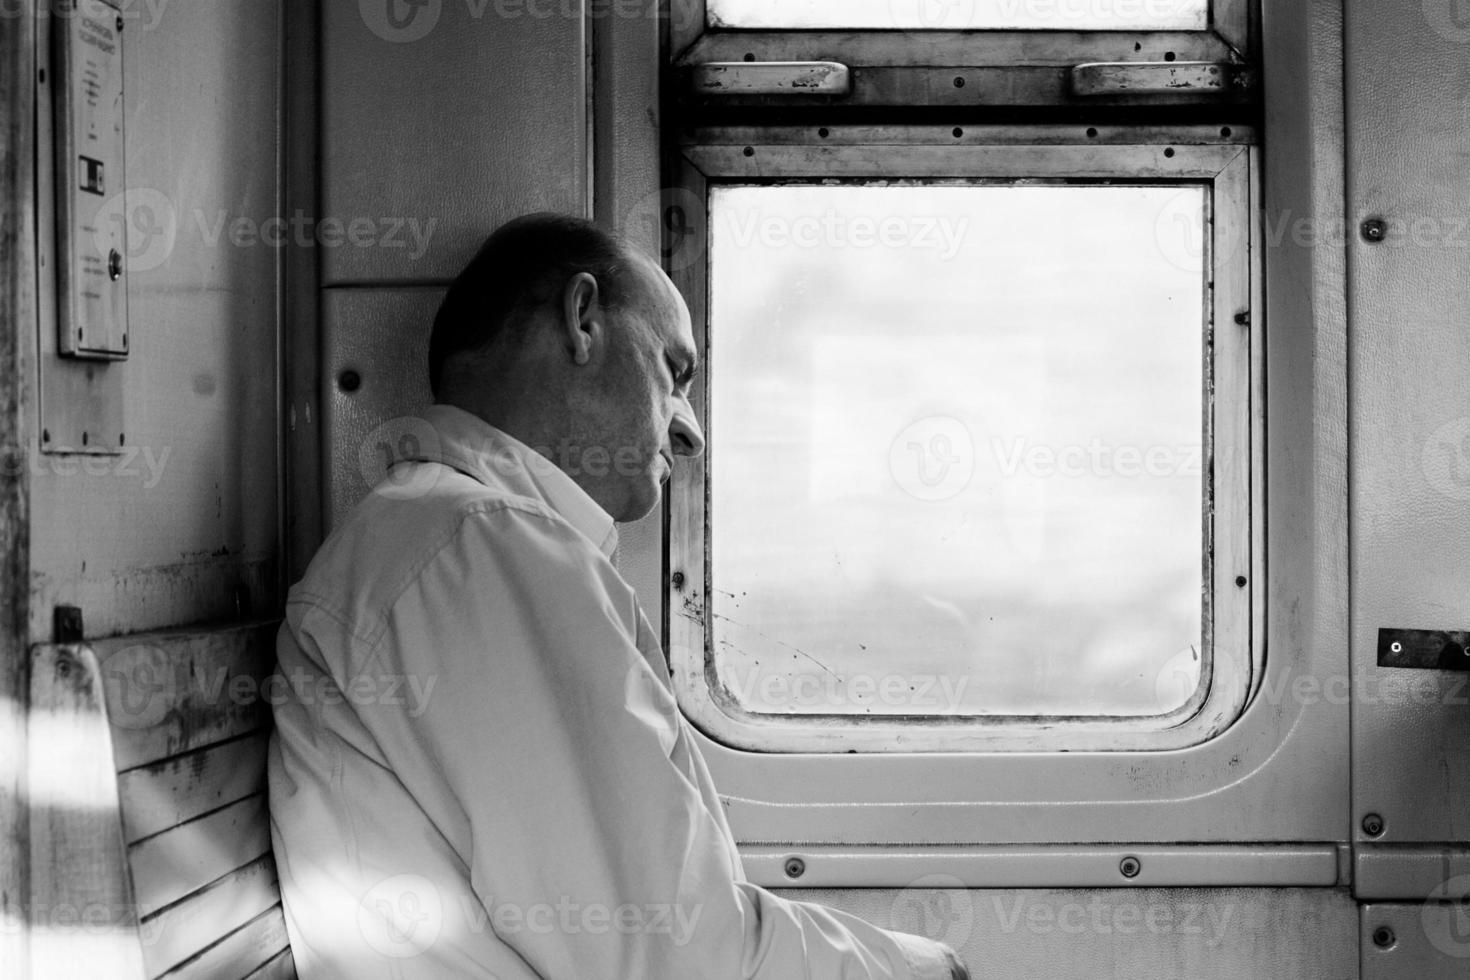 passagerare i tåg foto